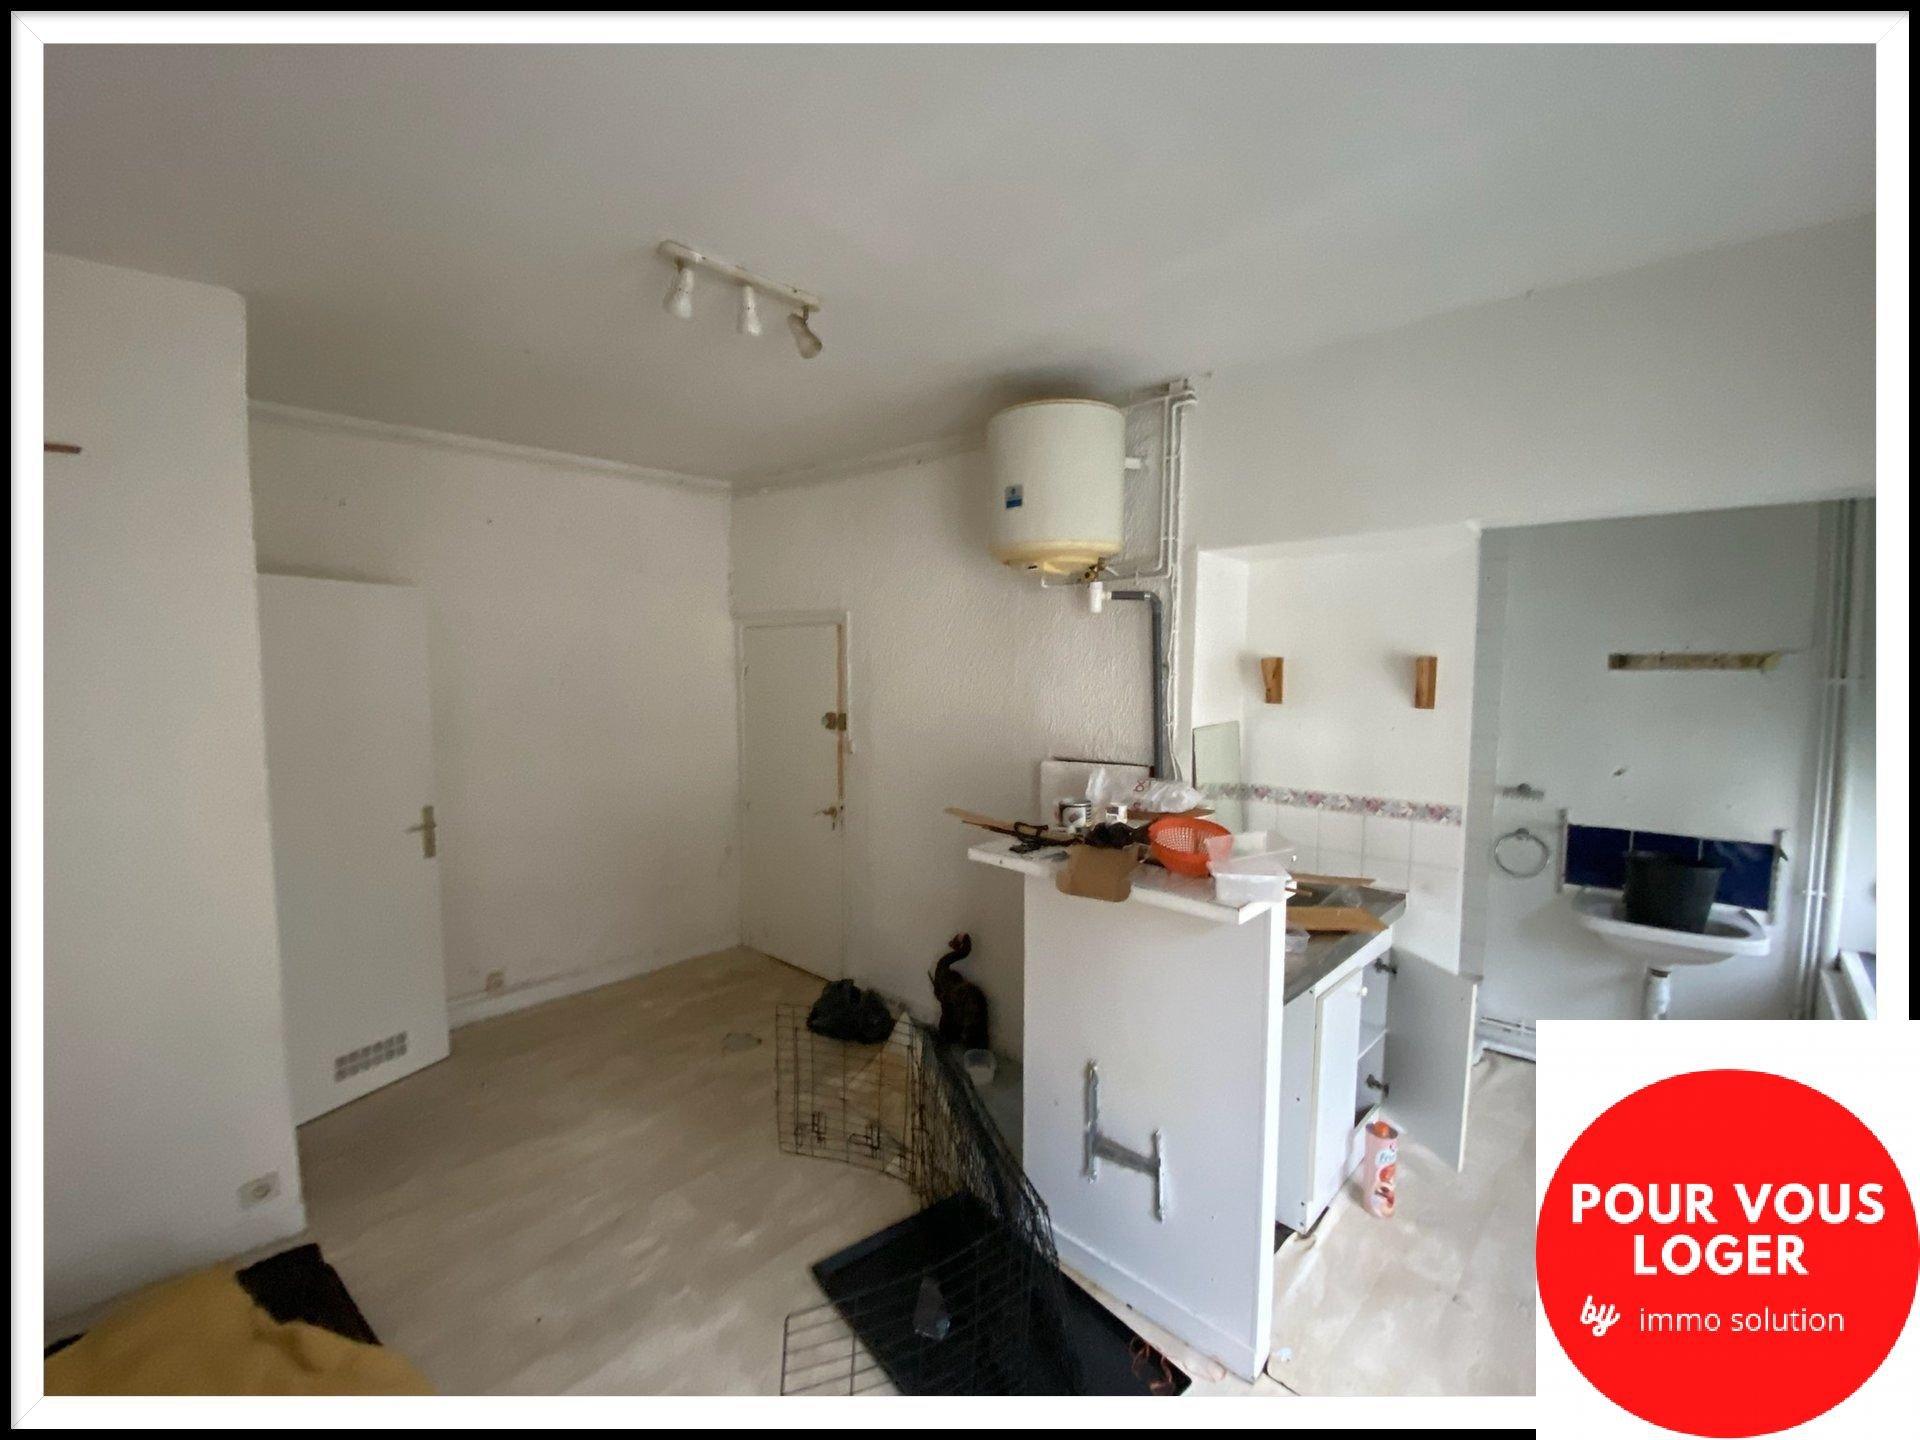 IMMEUBLE 3 studio meubles